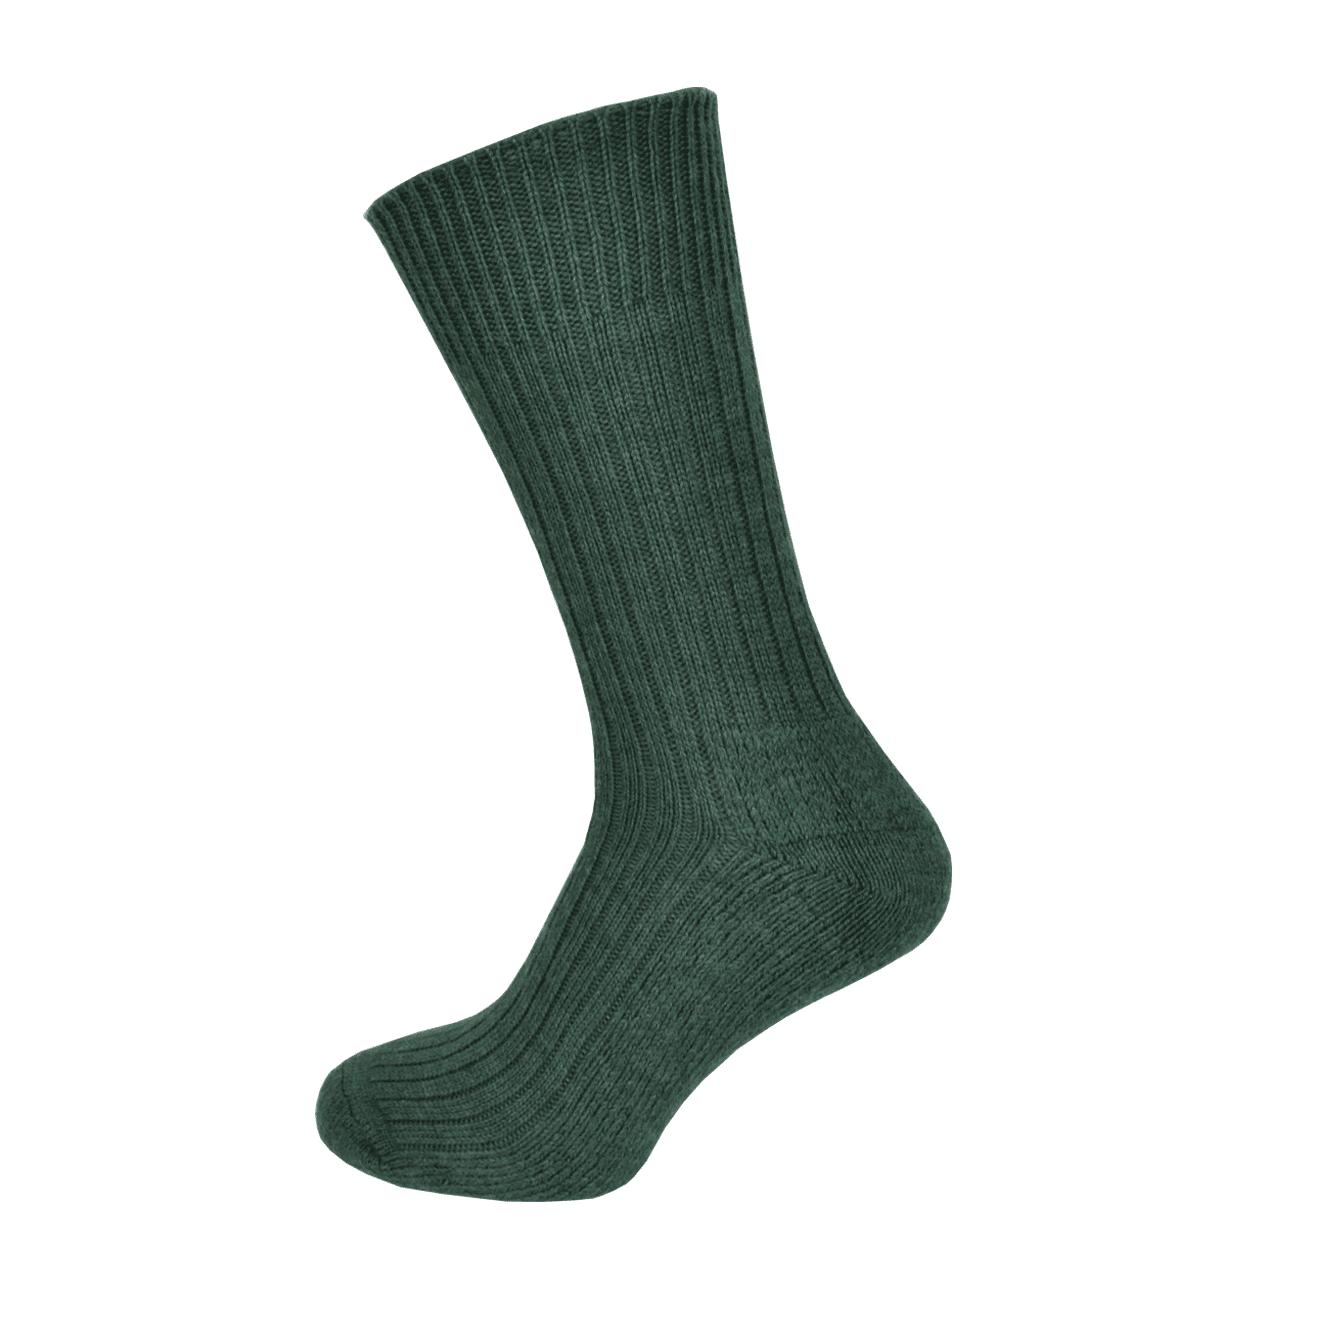 Macfarlaine Cushion Sole Socks Lovat Green